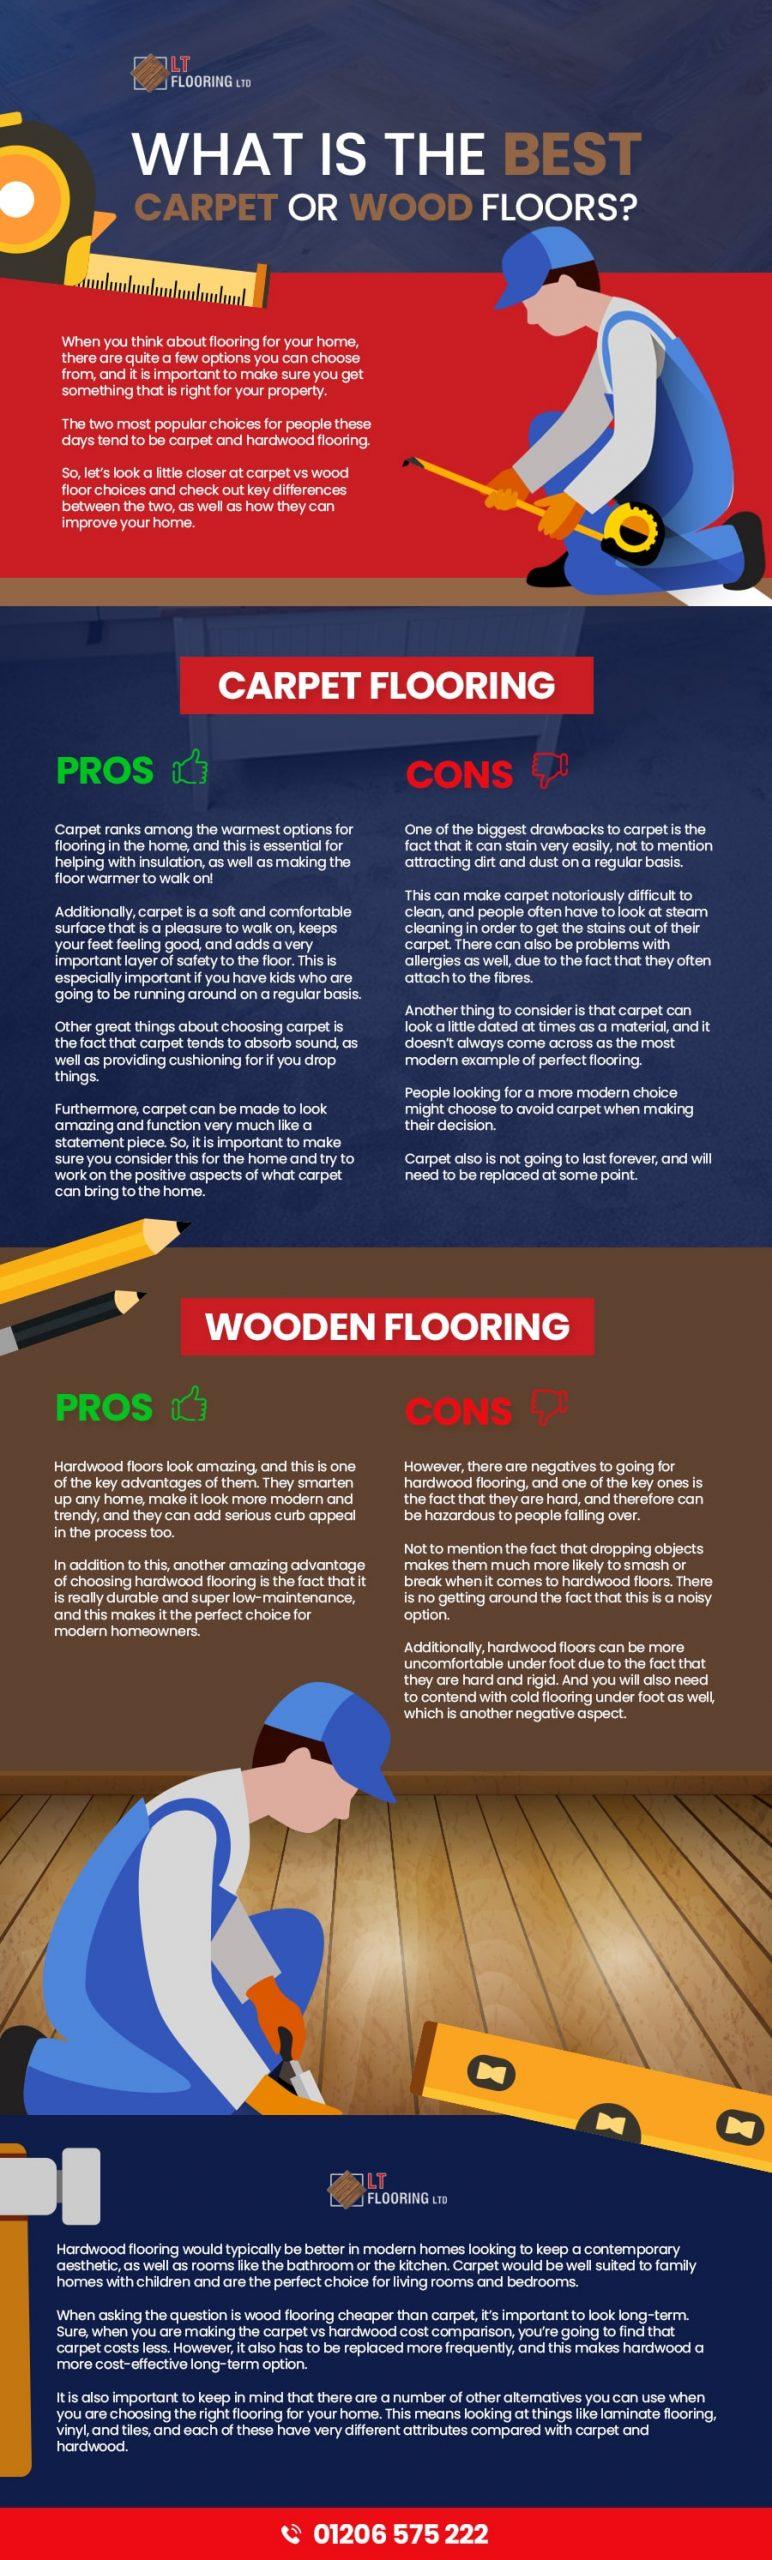 carpet or wood floor infographic